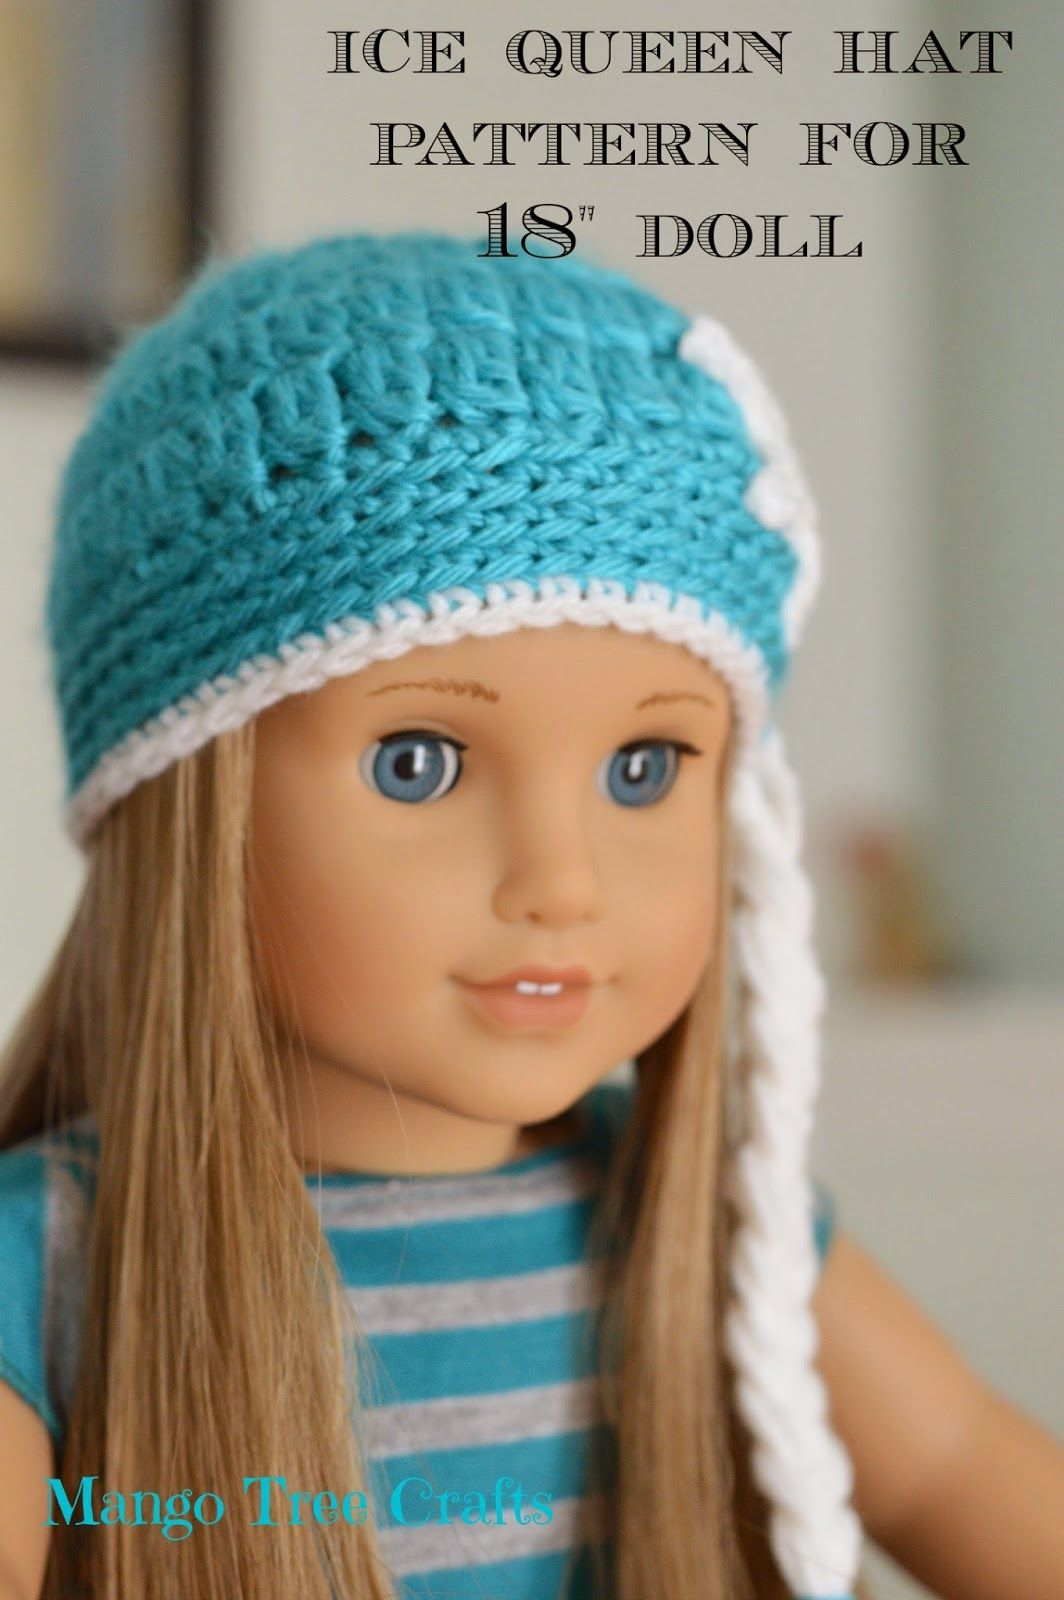 Ice queen crochet hat pattern for american girl doll american ice queen crochet hat pattern for american girl doll bankloansurffo Gallery